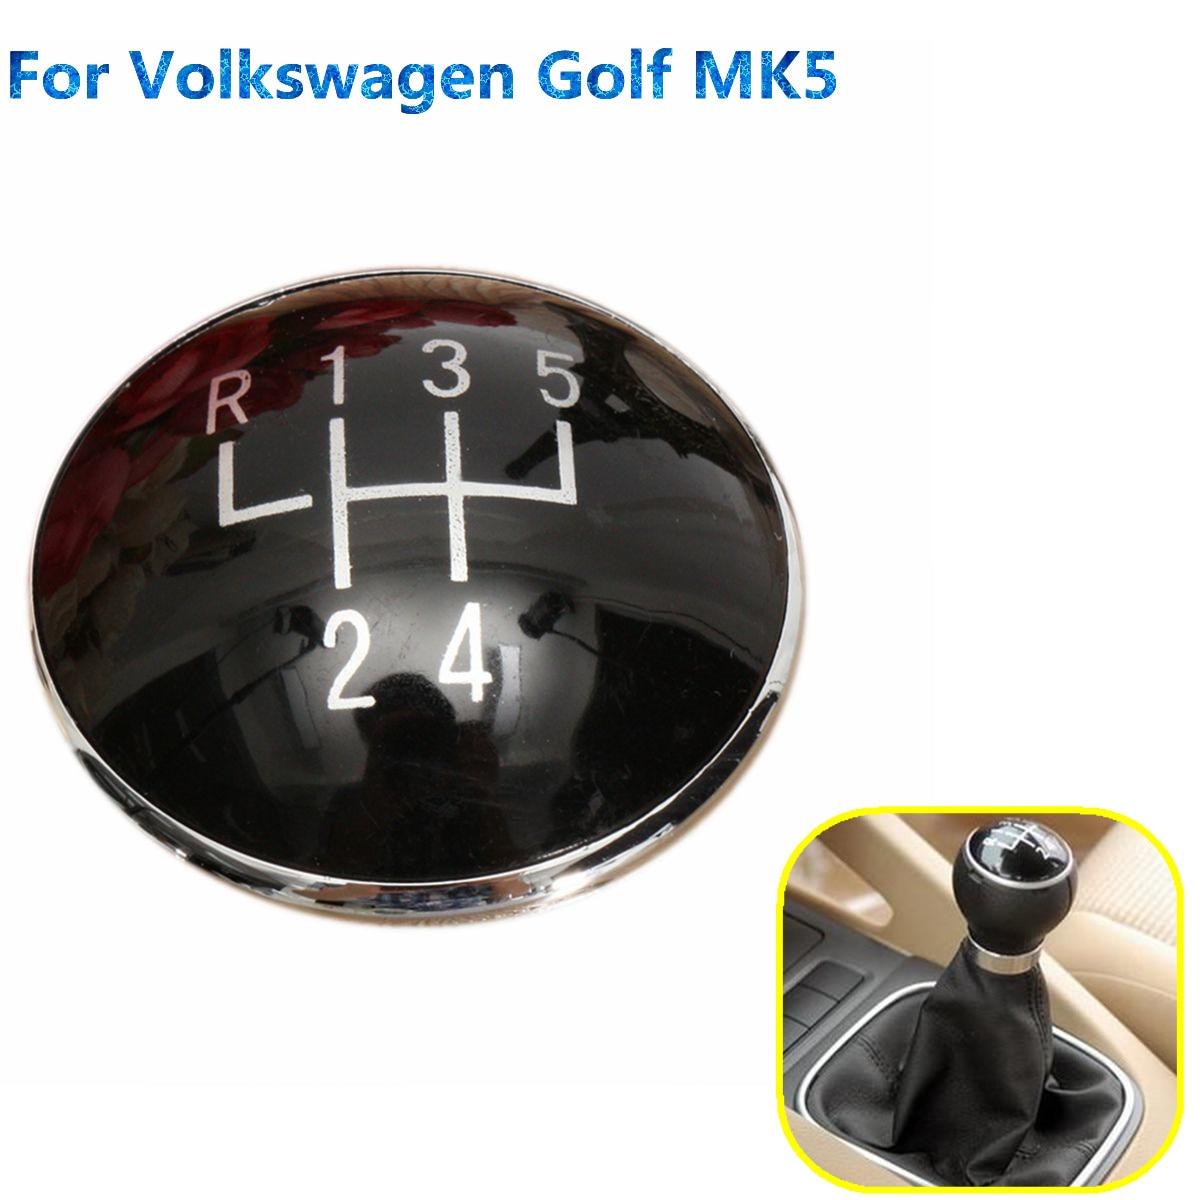 Perilla de engranaje negra de 5 velocidades, emblema, gorro distintivo, apto para Volkswagen Golf V MK5 2003-2009